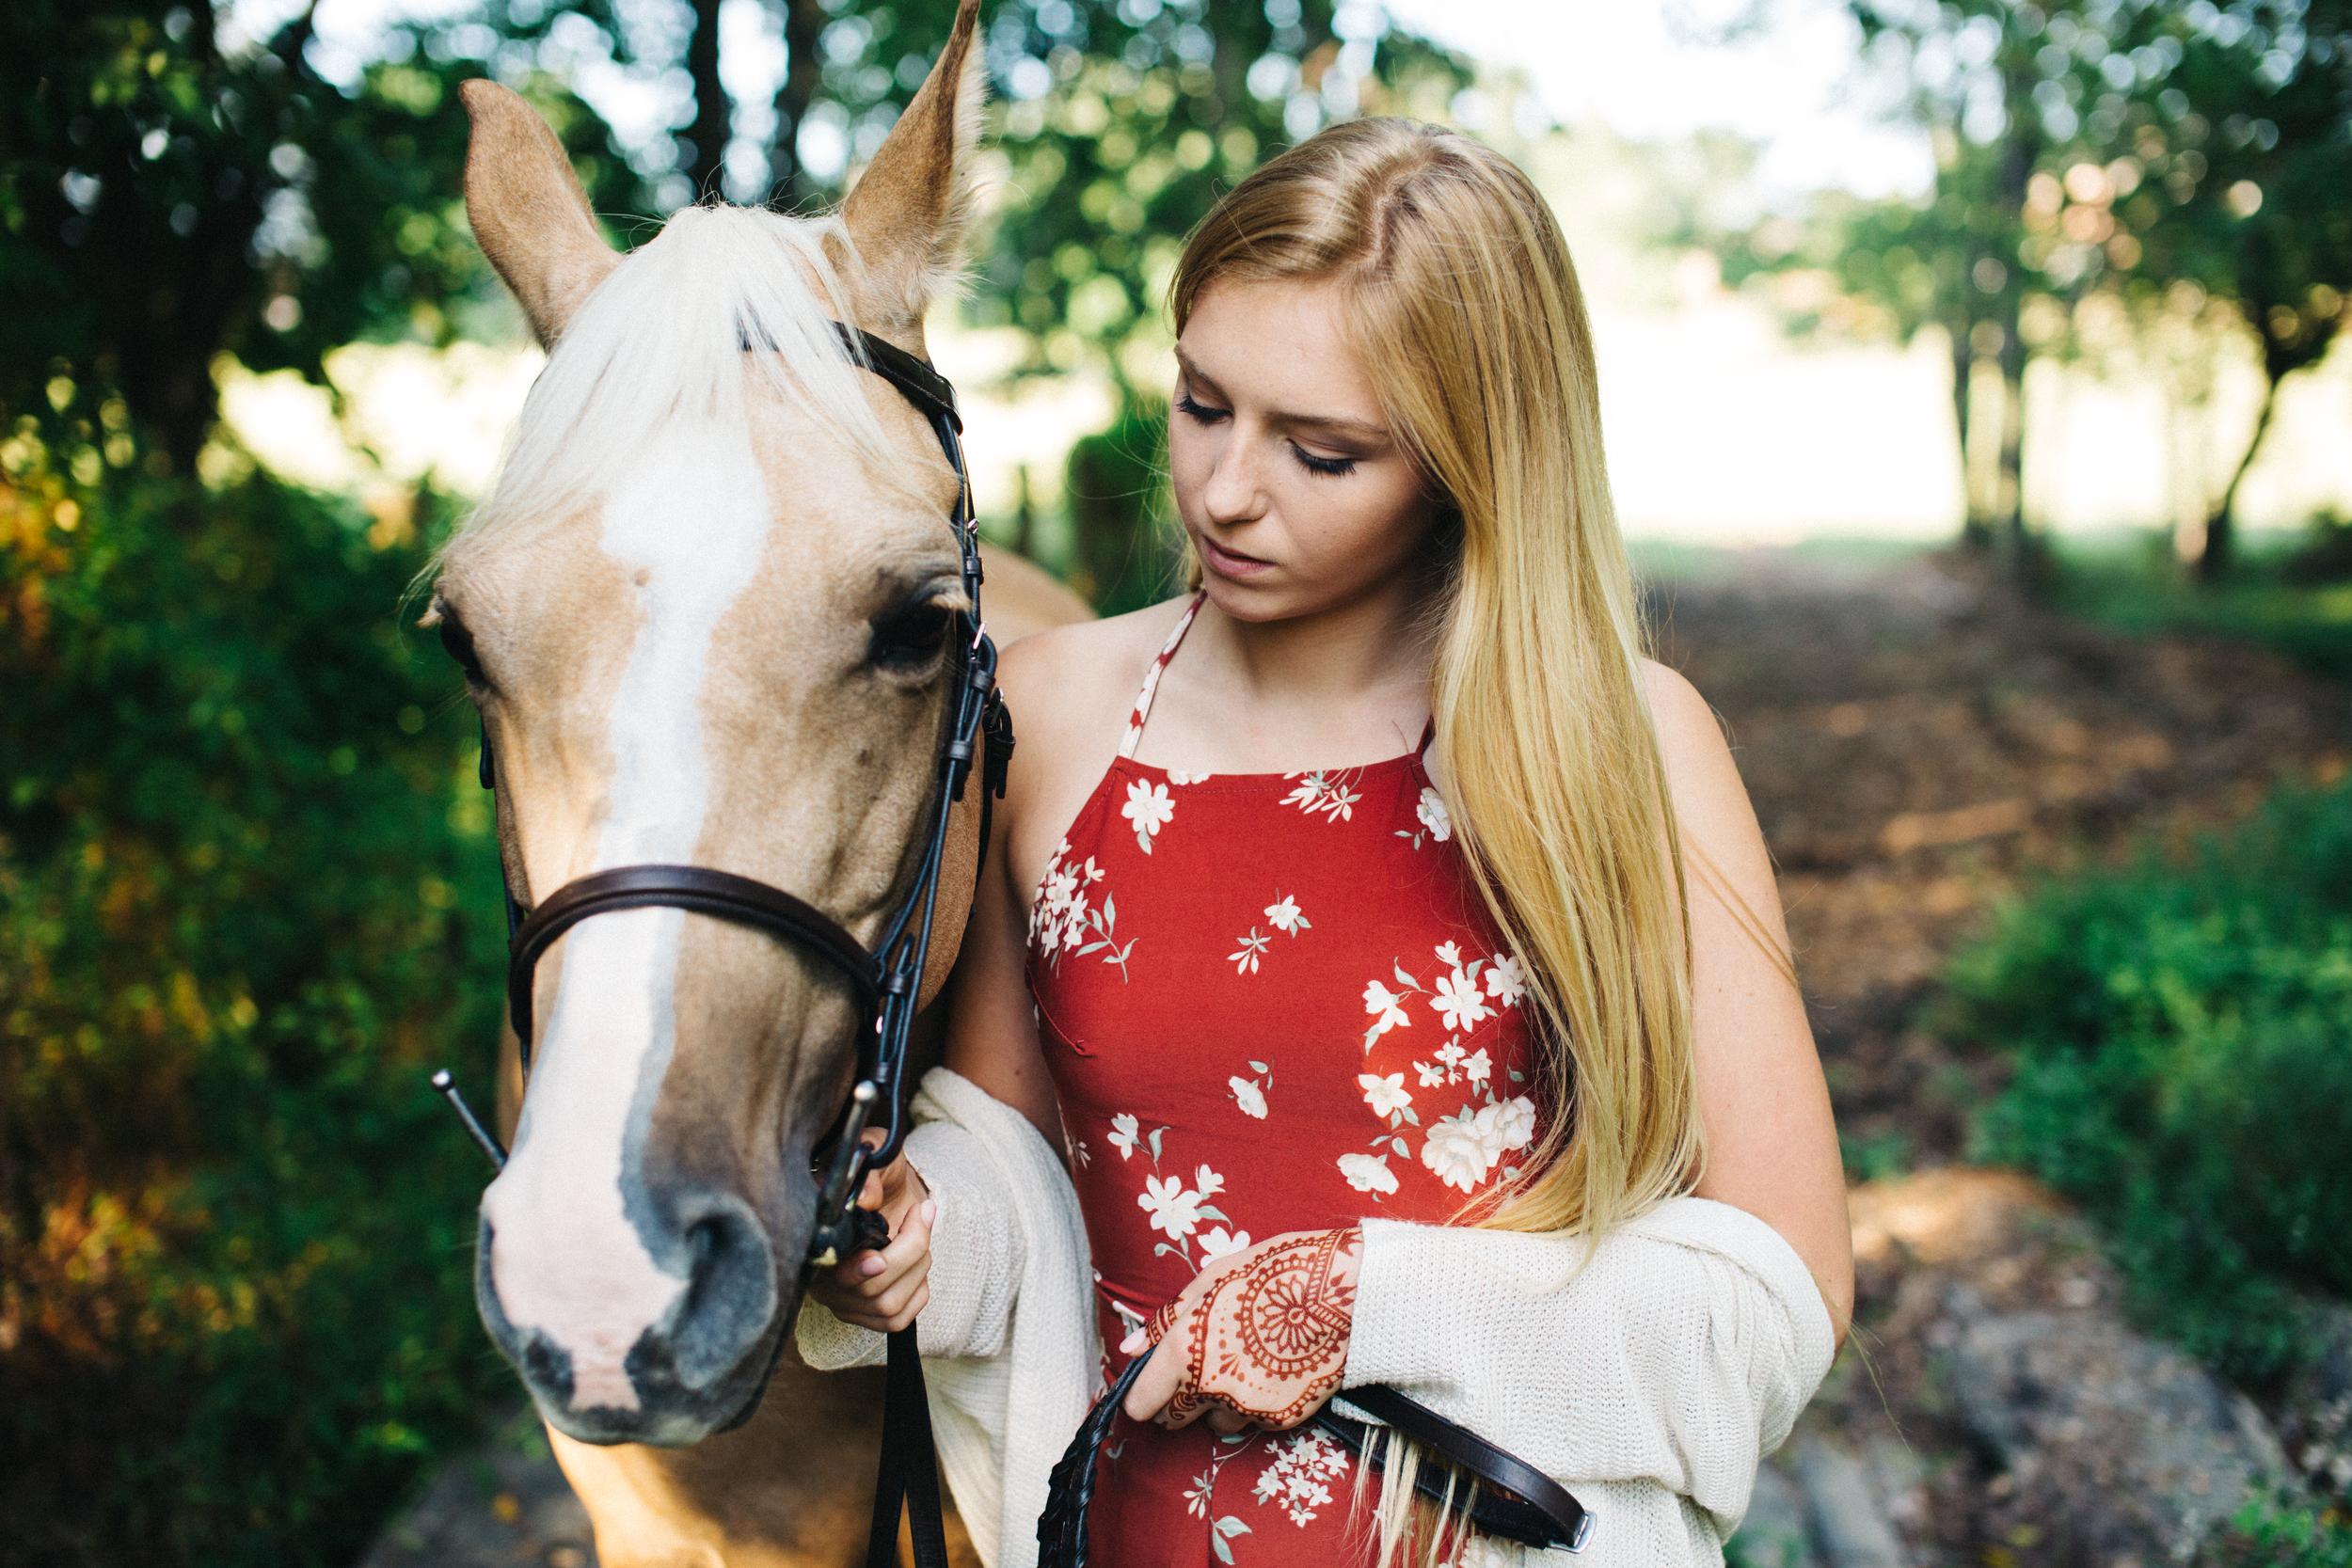 annapolis-maryland-senior-portrait-session-photographer-boho-horse-inspo-emma-jean-photography-4-photo.jpg